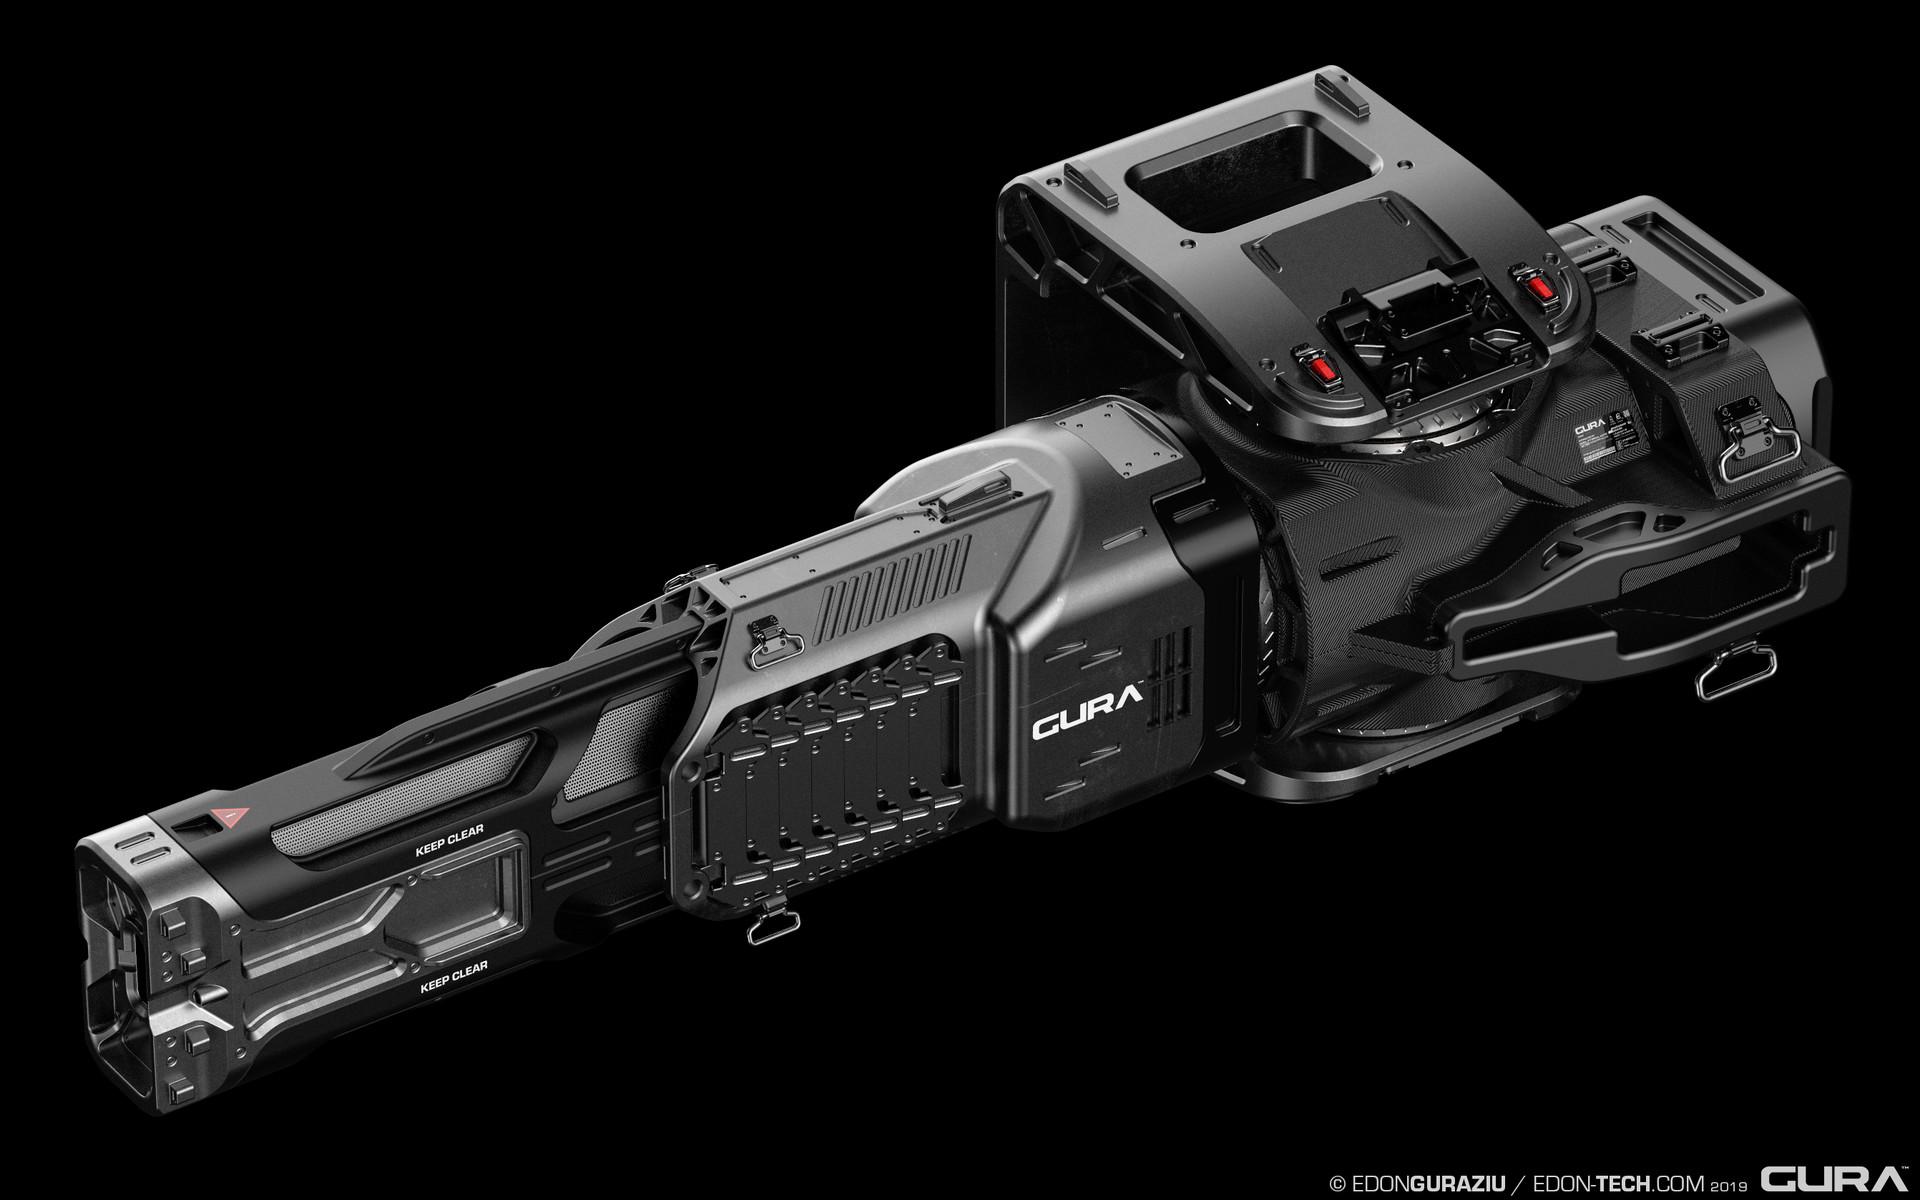 Edon guraziu laser canon image a